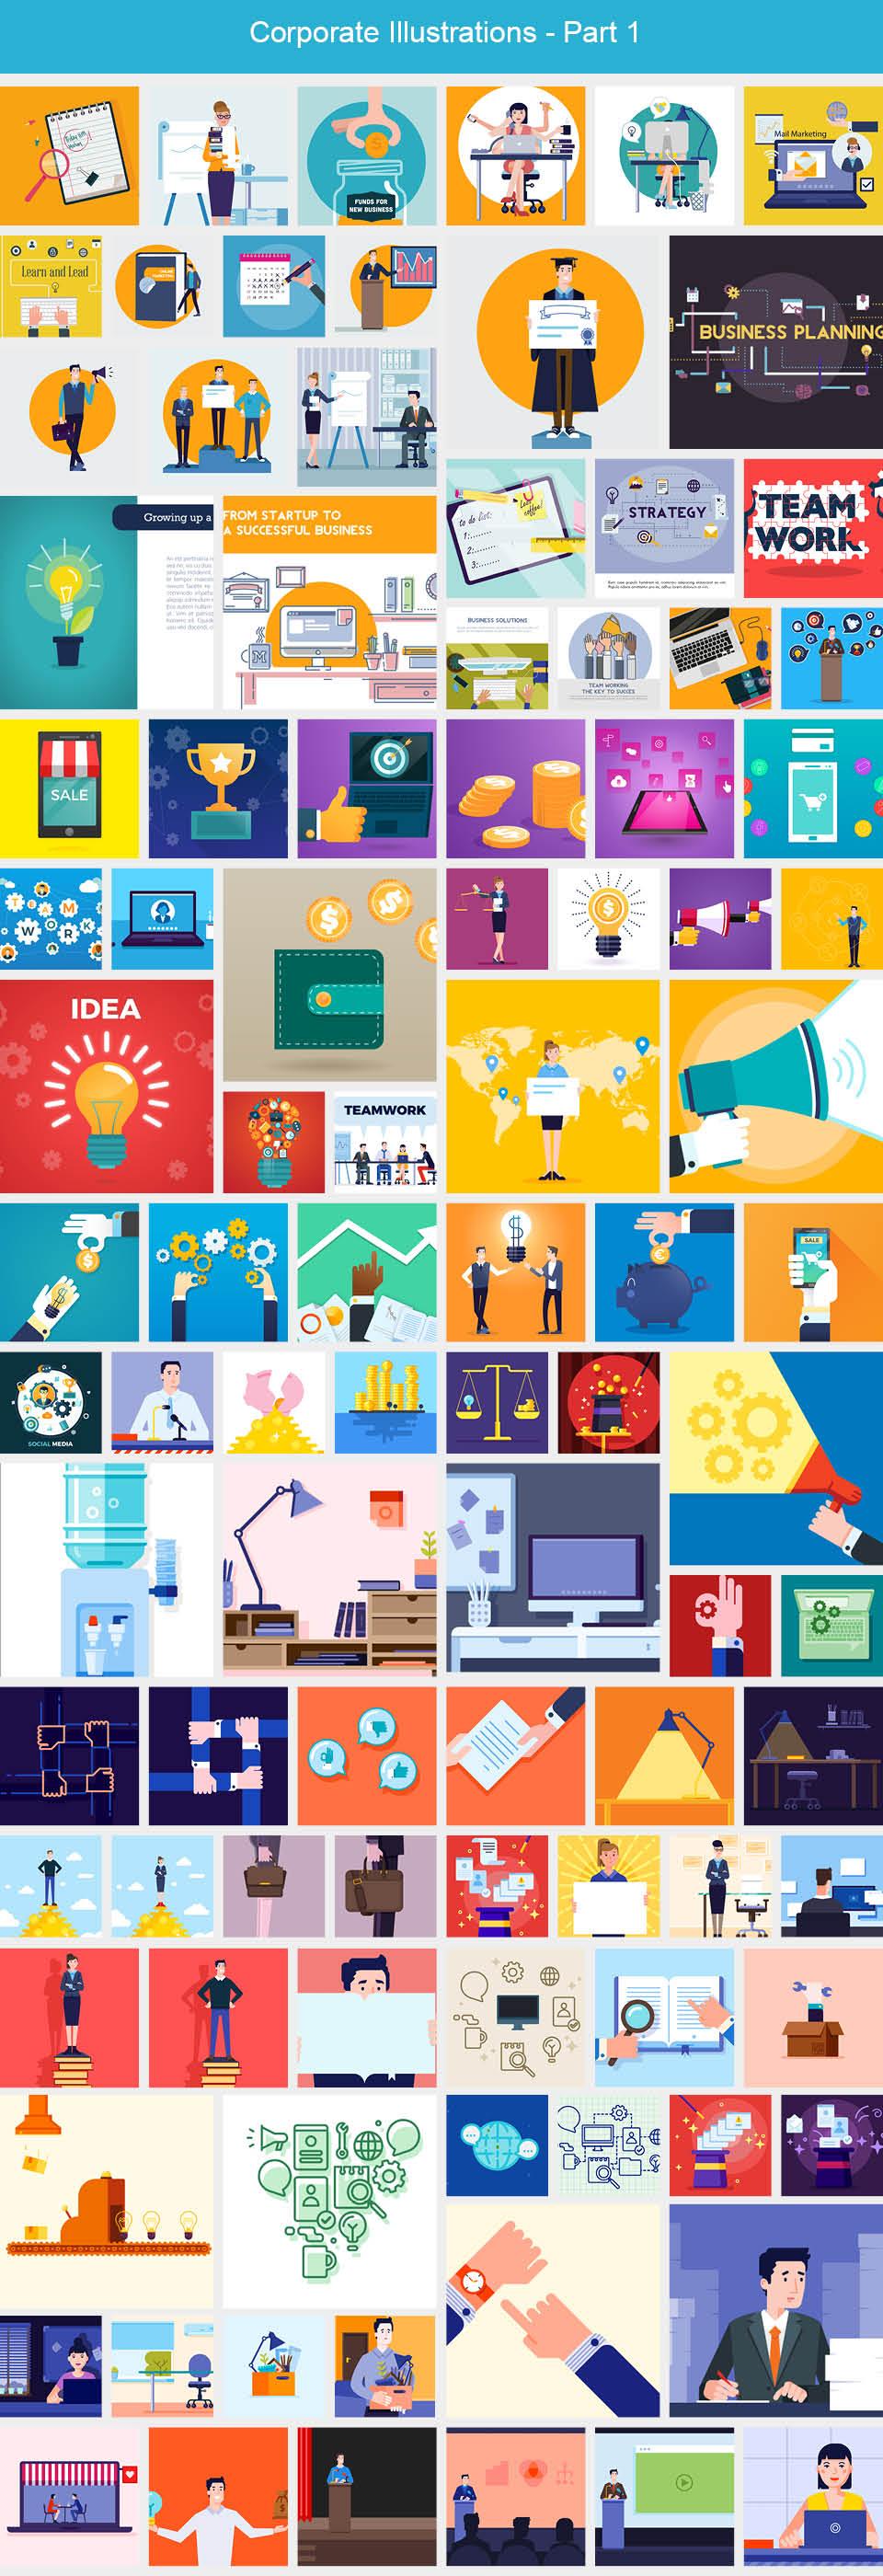 187 Corporate Vector Illustrations